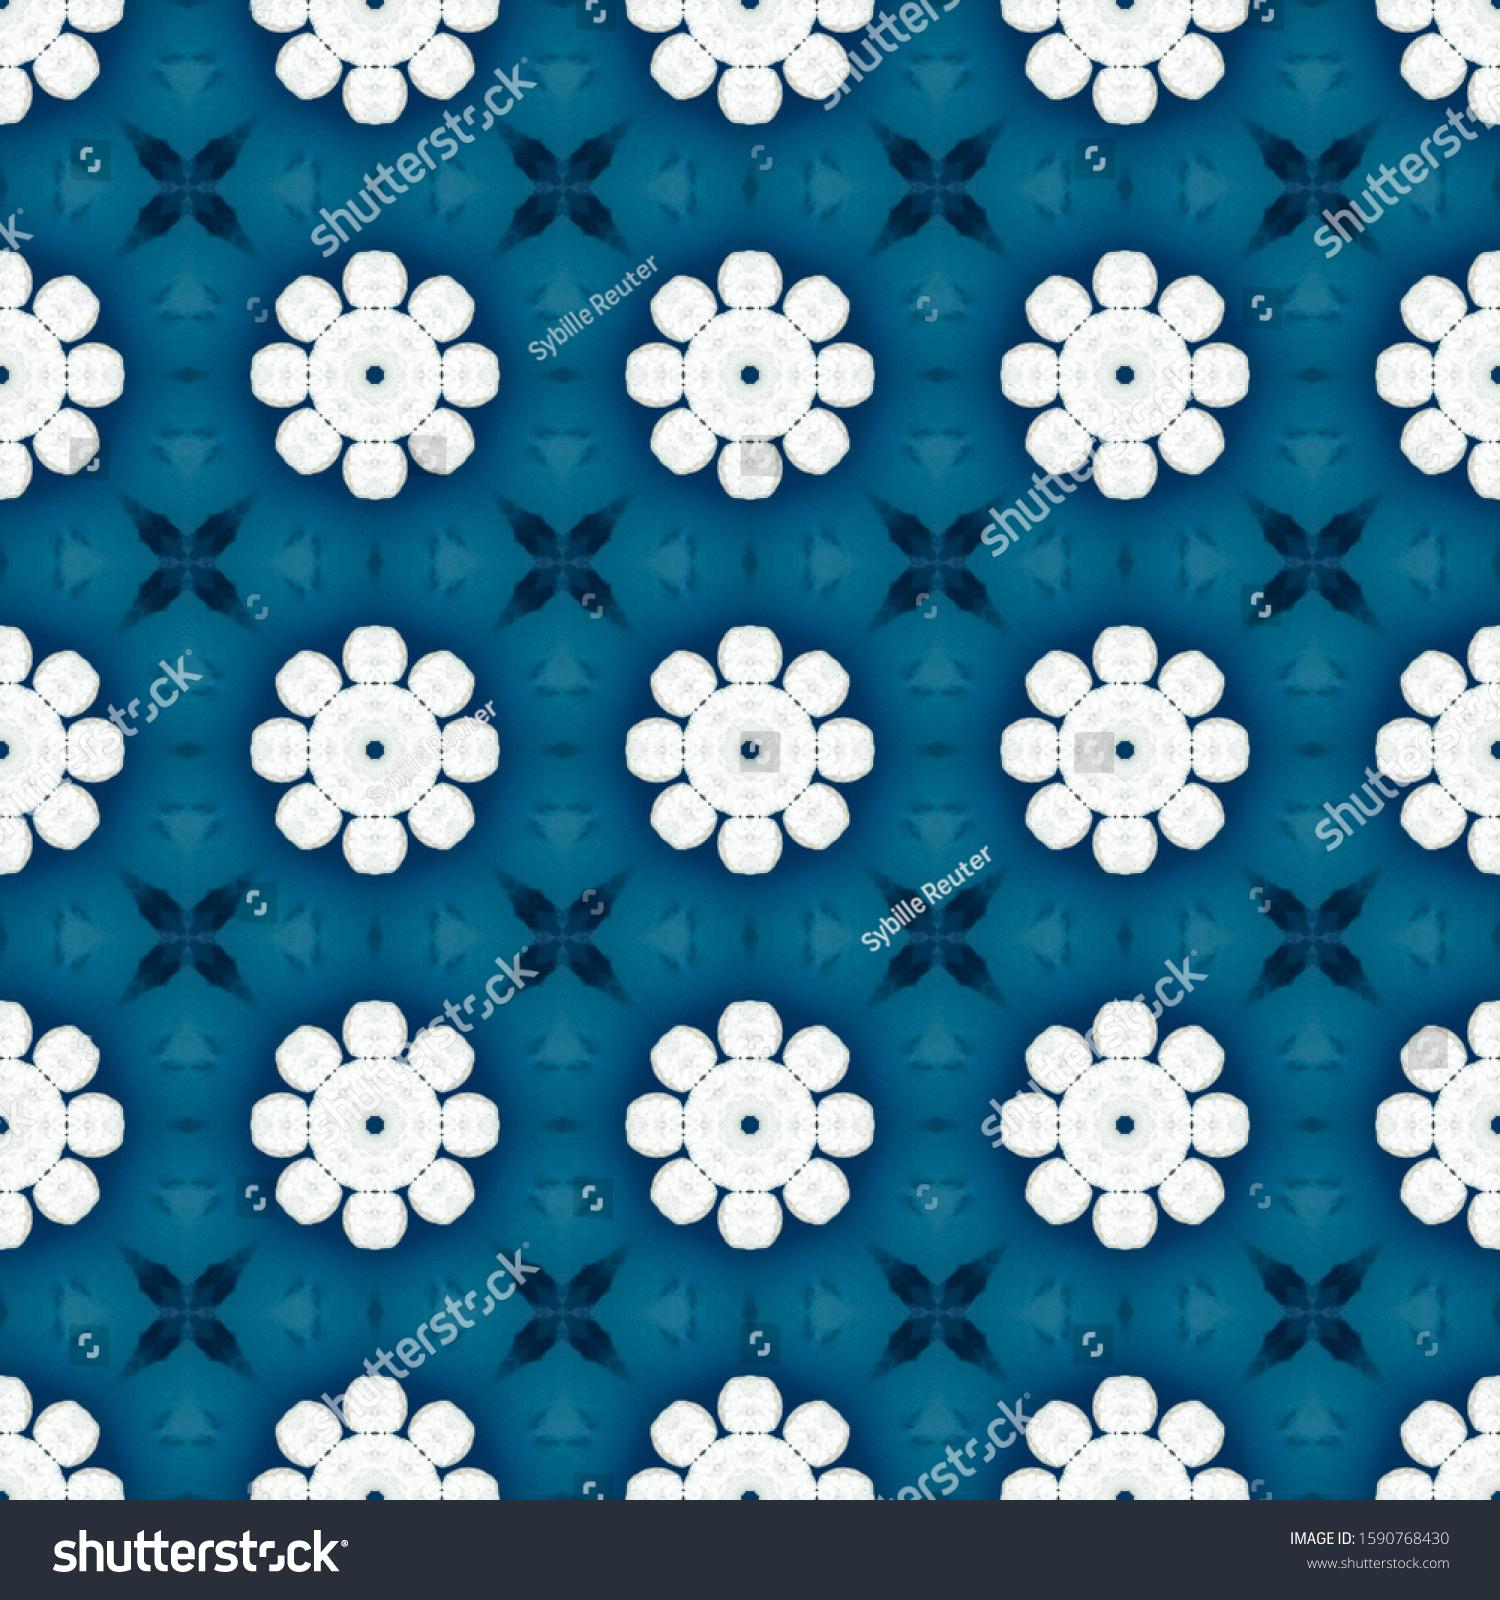 stock-photo-retro-style-seamless-pattern